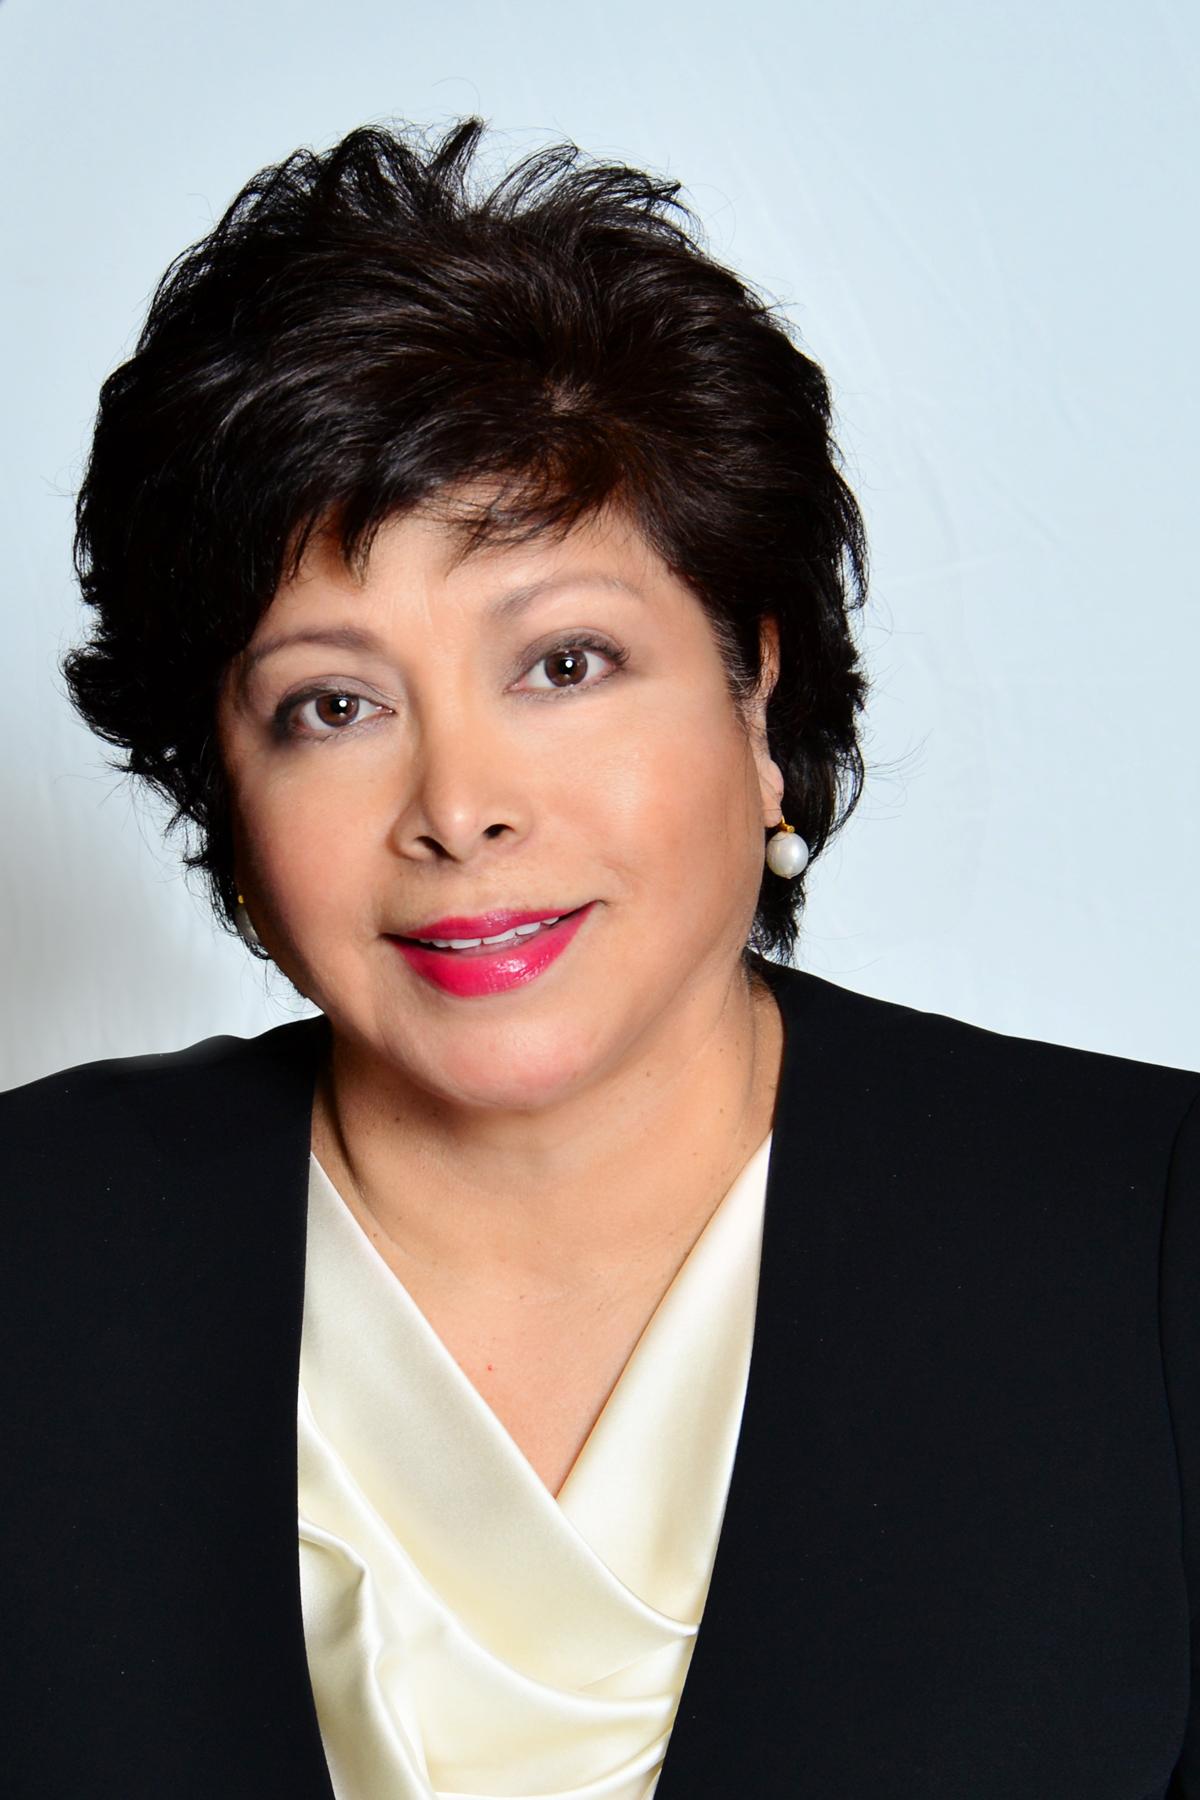 Liz Lara Carreño